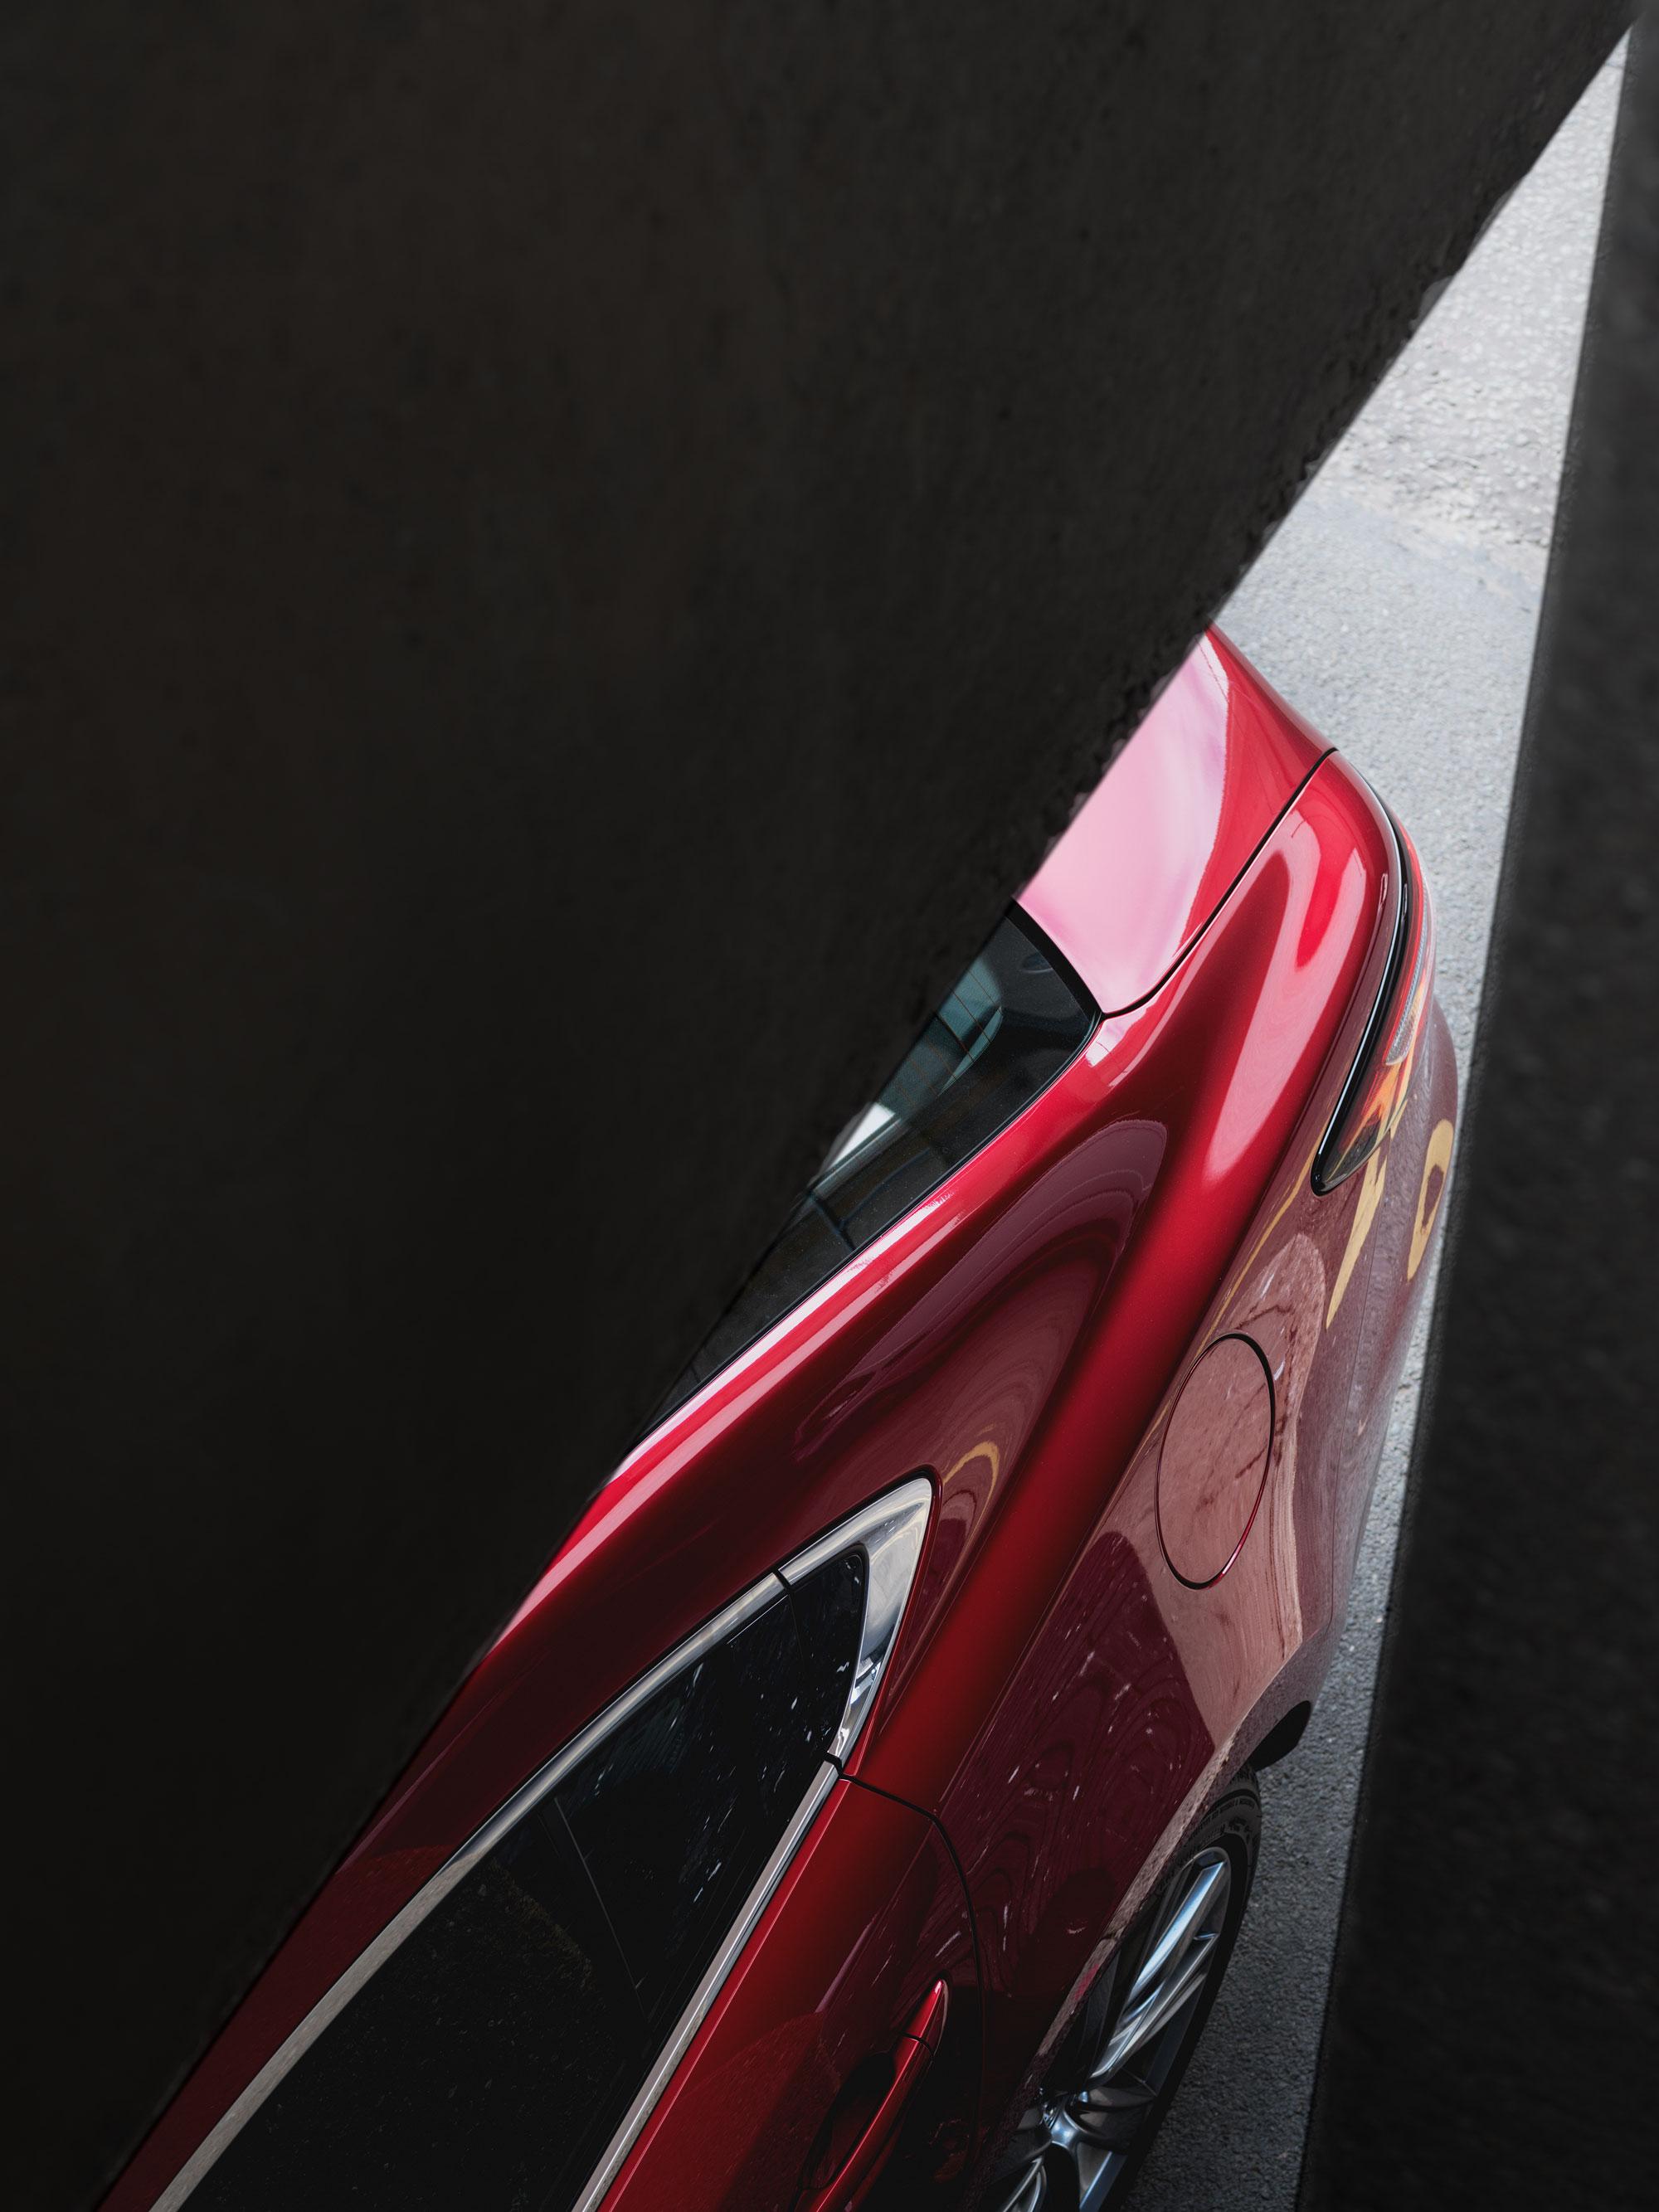 276_Mazda6_Joseph_Ford_441b.jpg